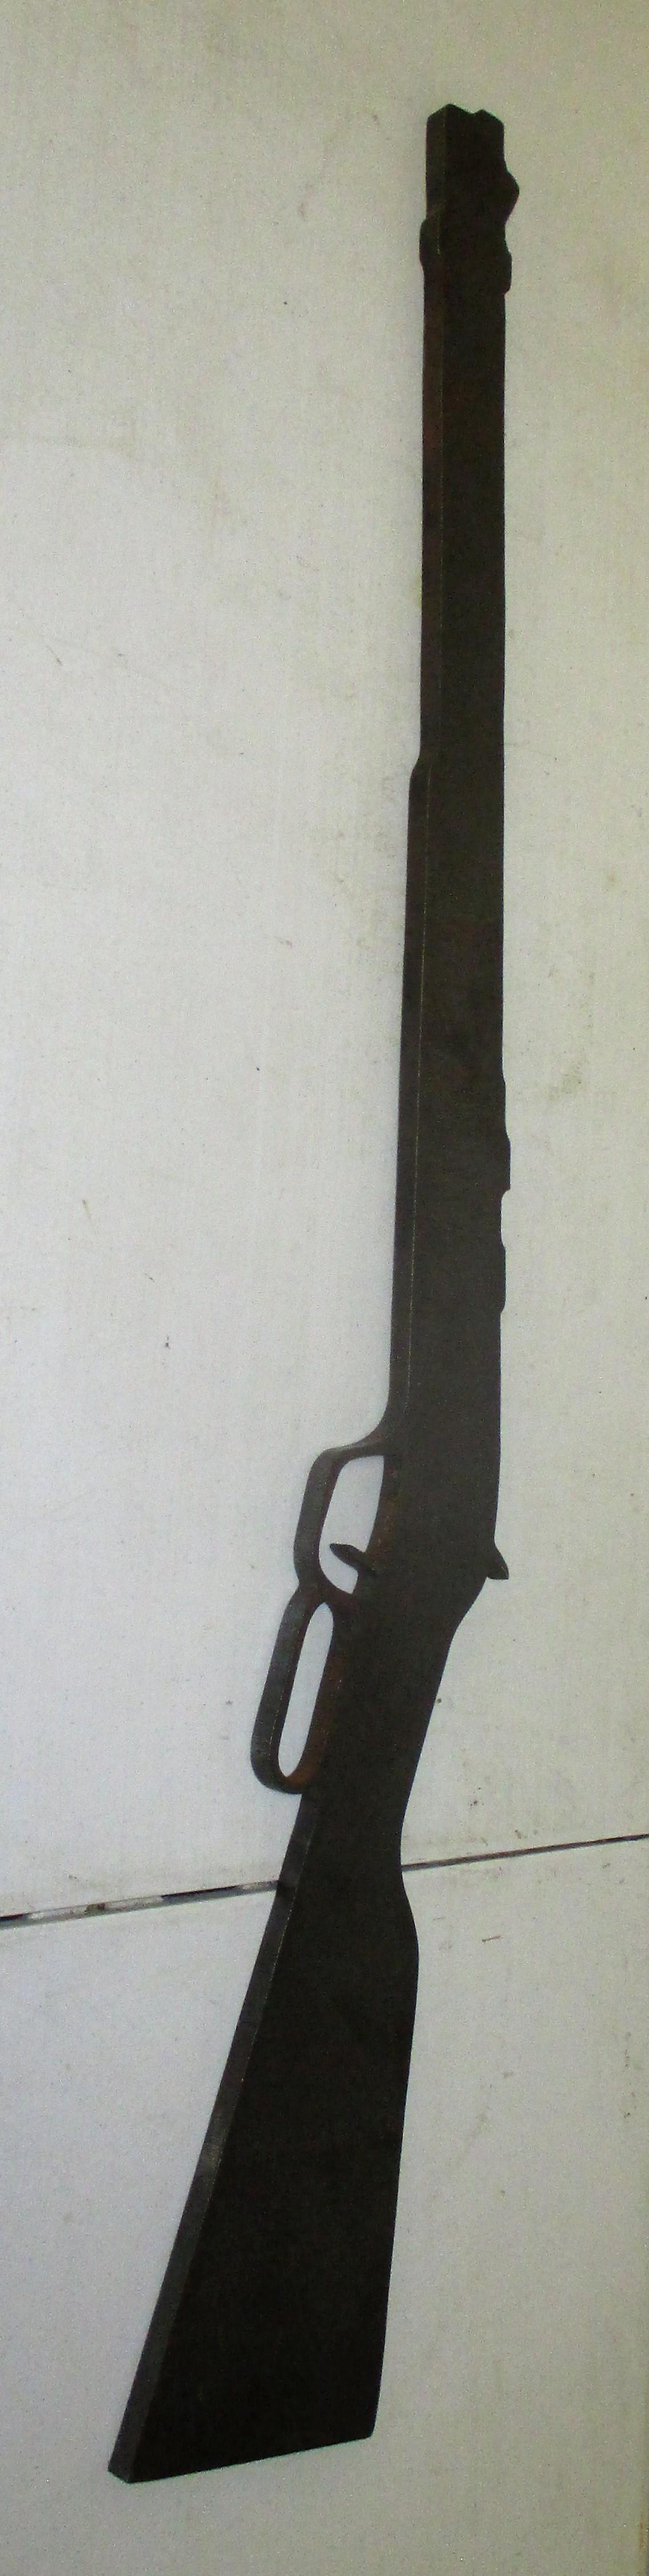 124: Heavy Steel Gun Tradesign (?)